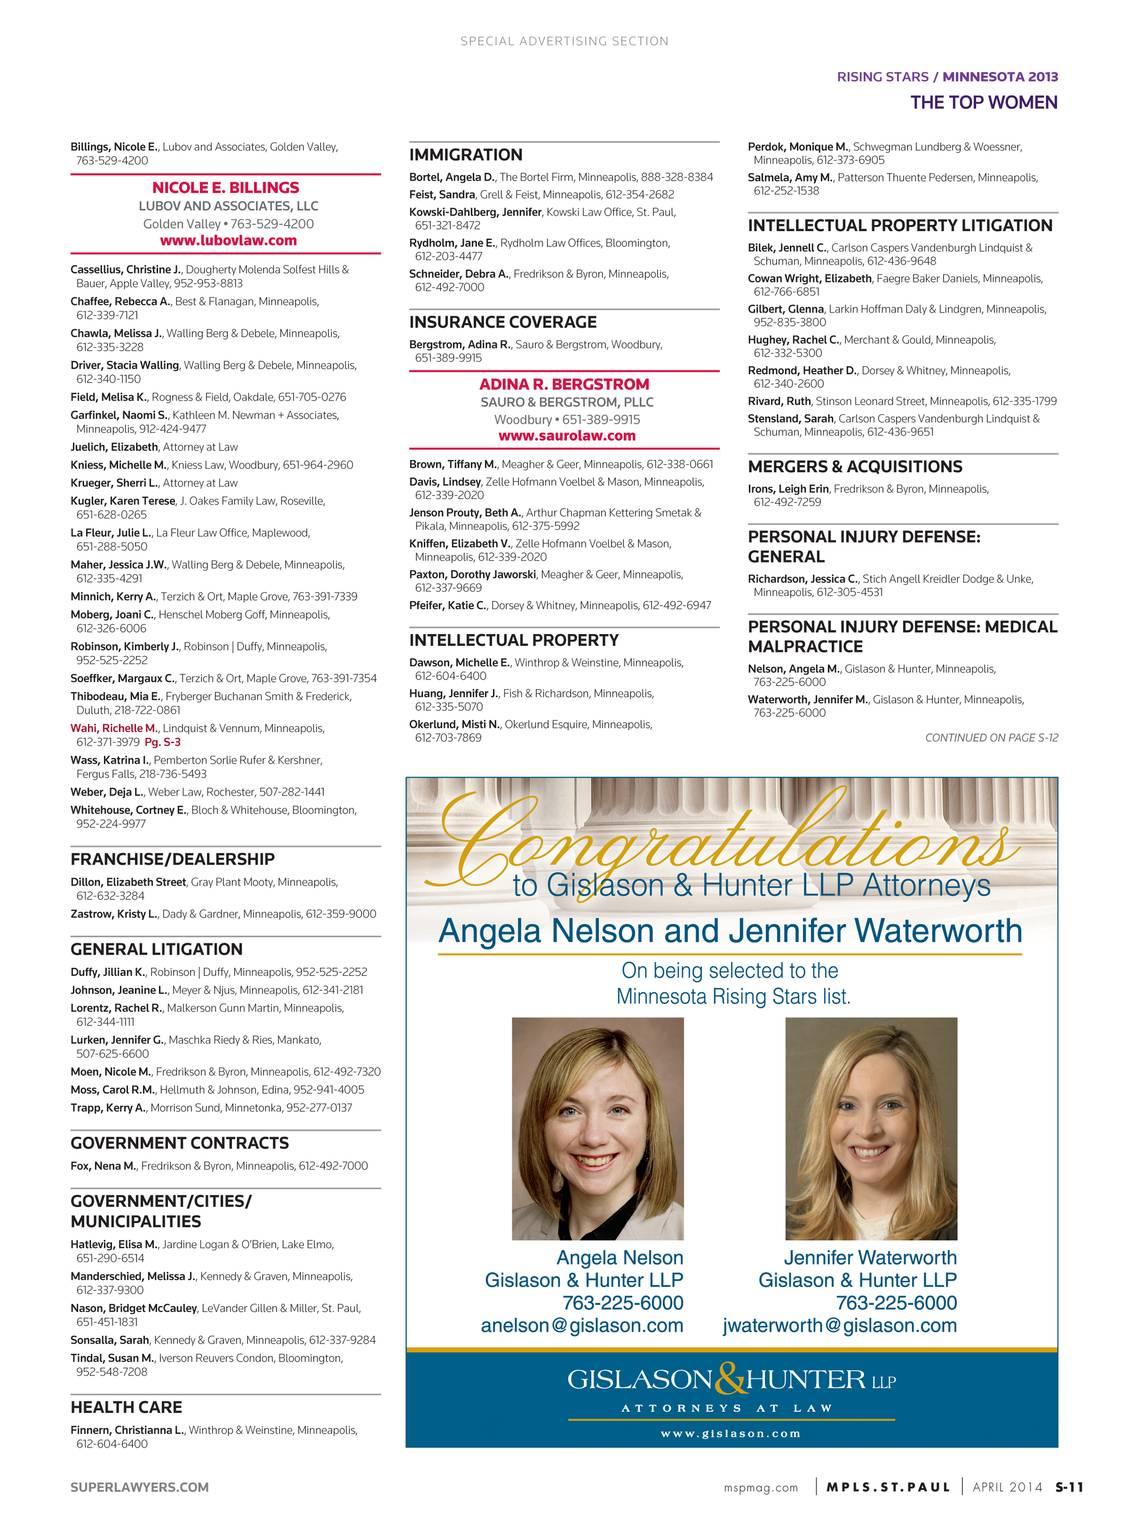 Super Lawyers - Colorado 2014 - page S-12